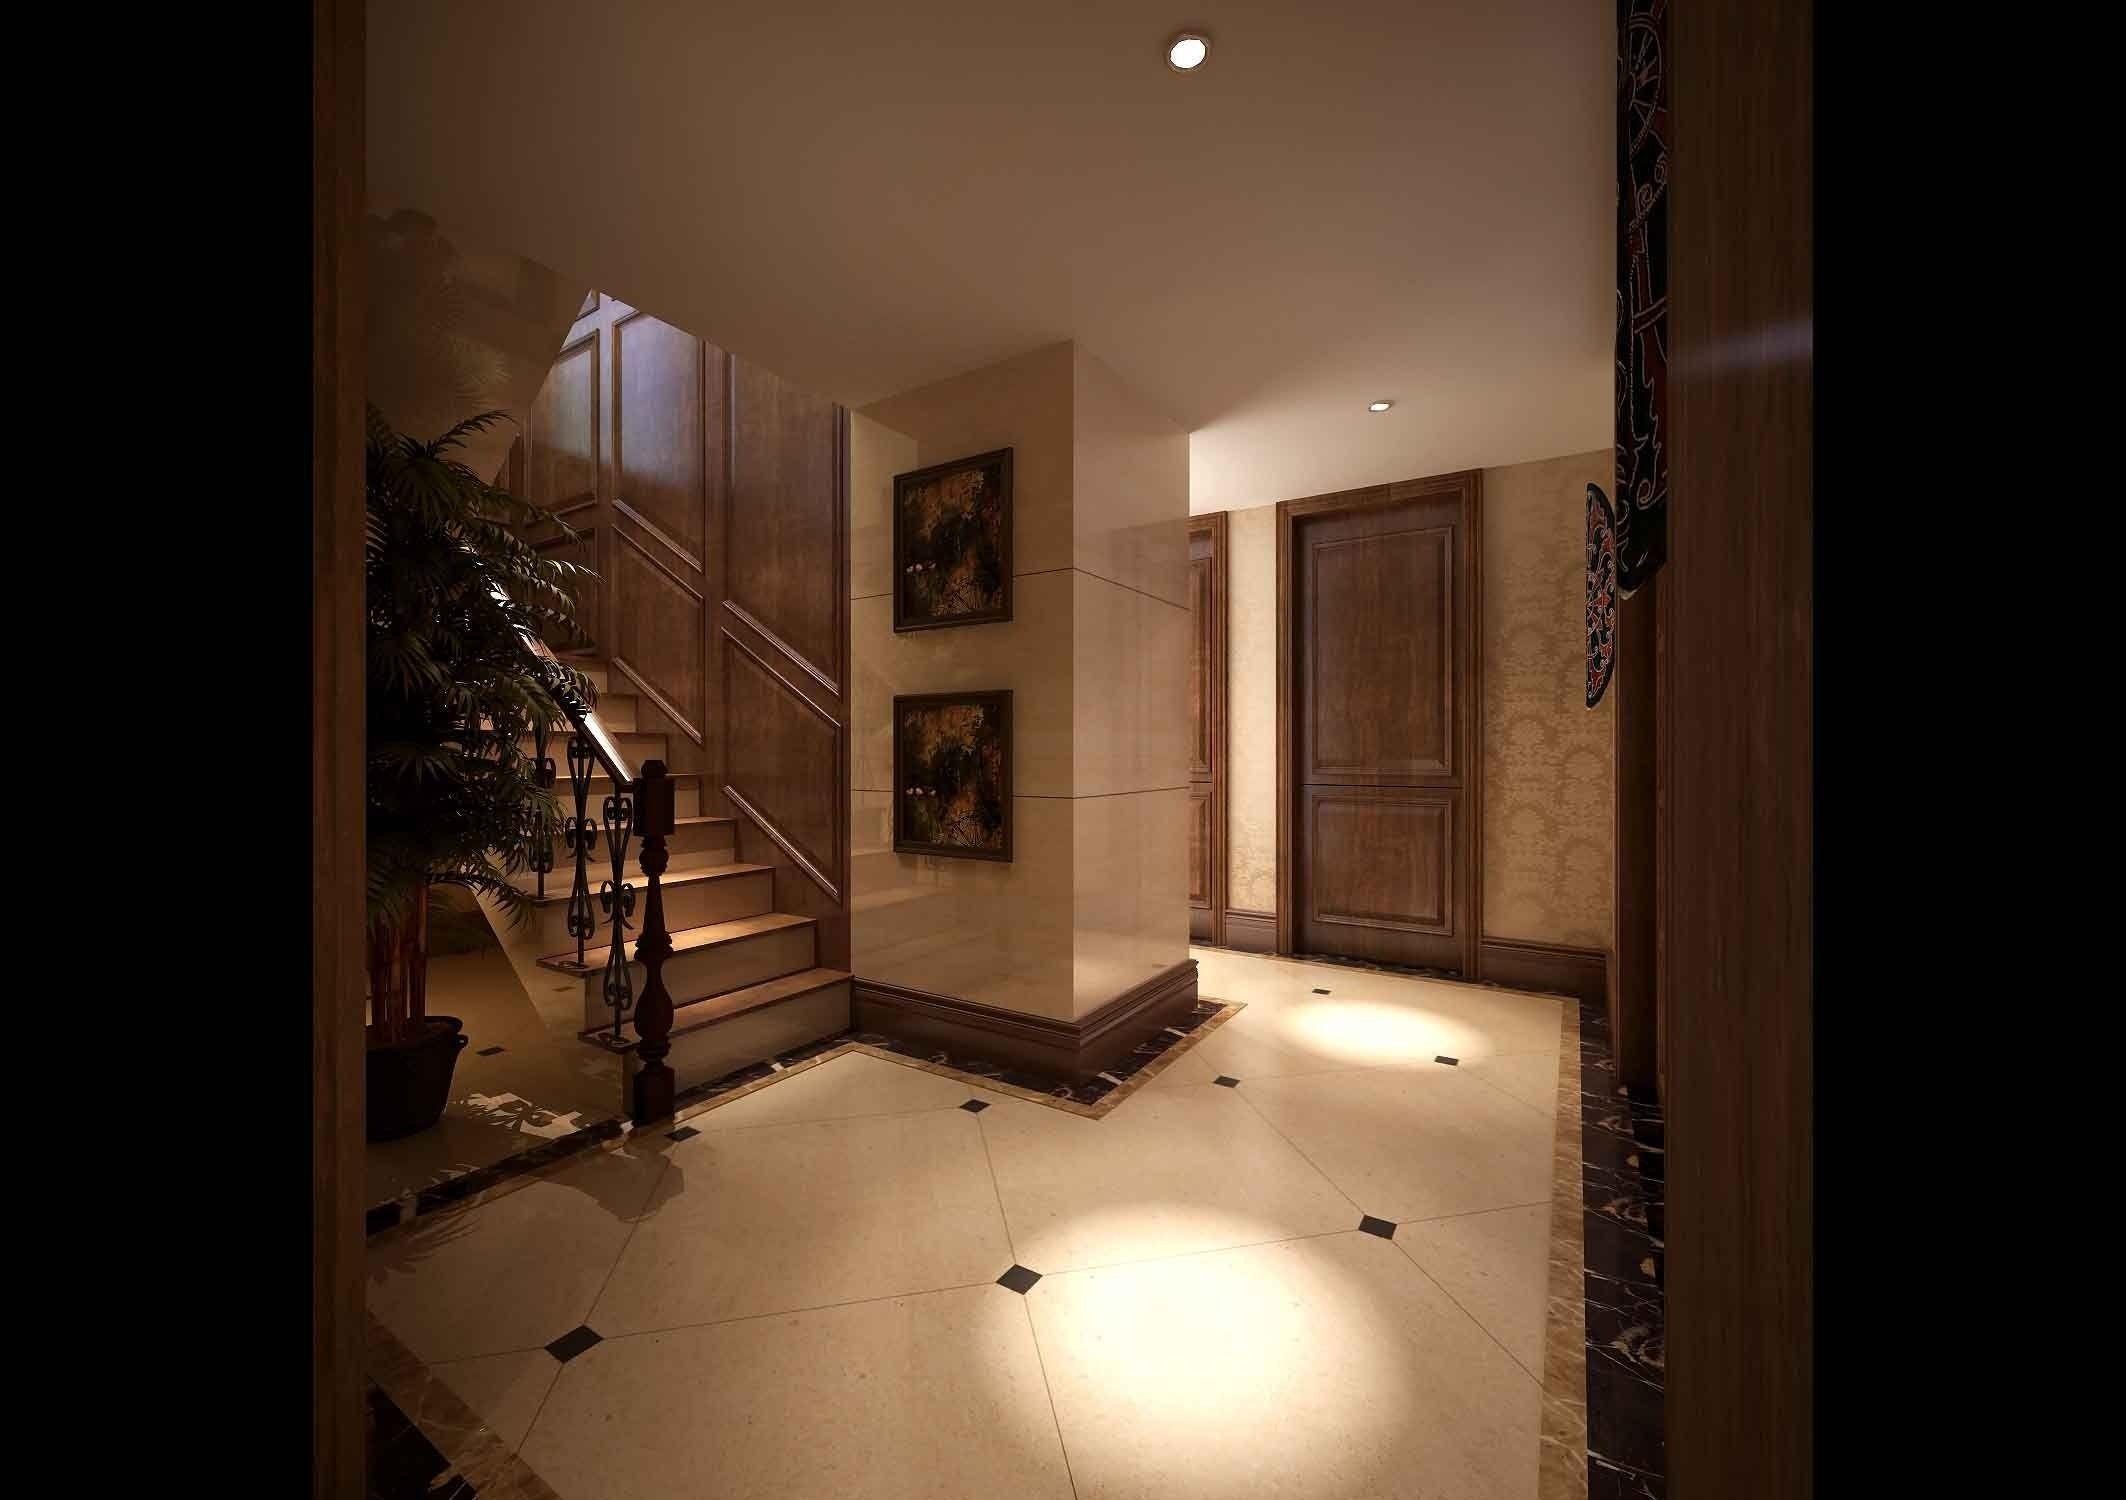 Realistic living room design 174 3d model max for Realistic living room ideas